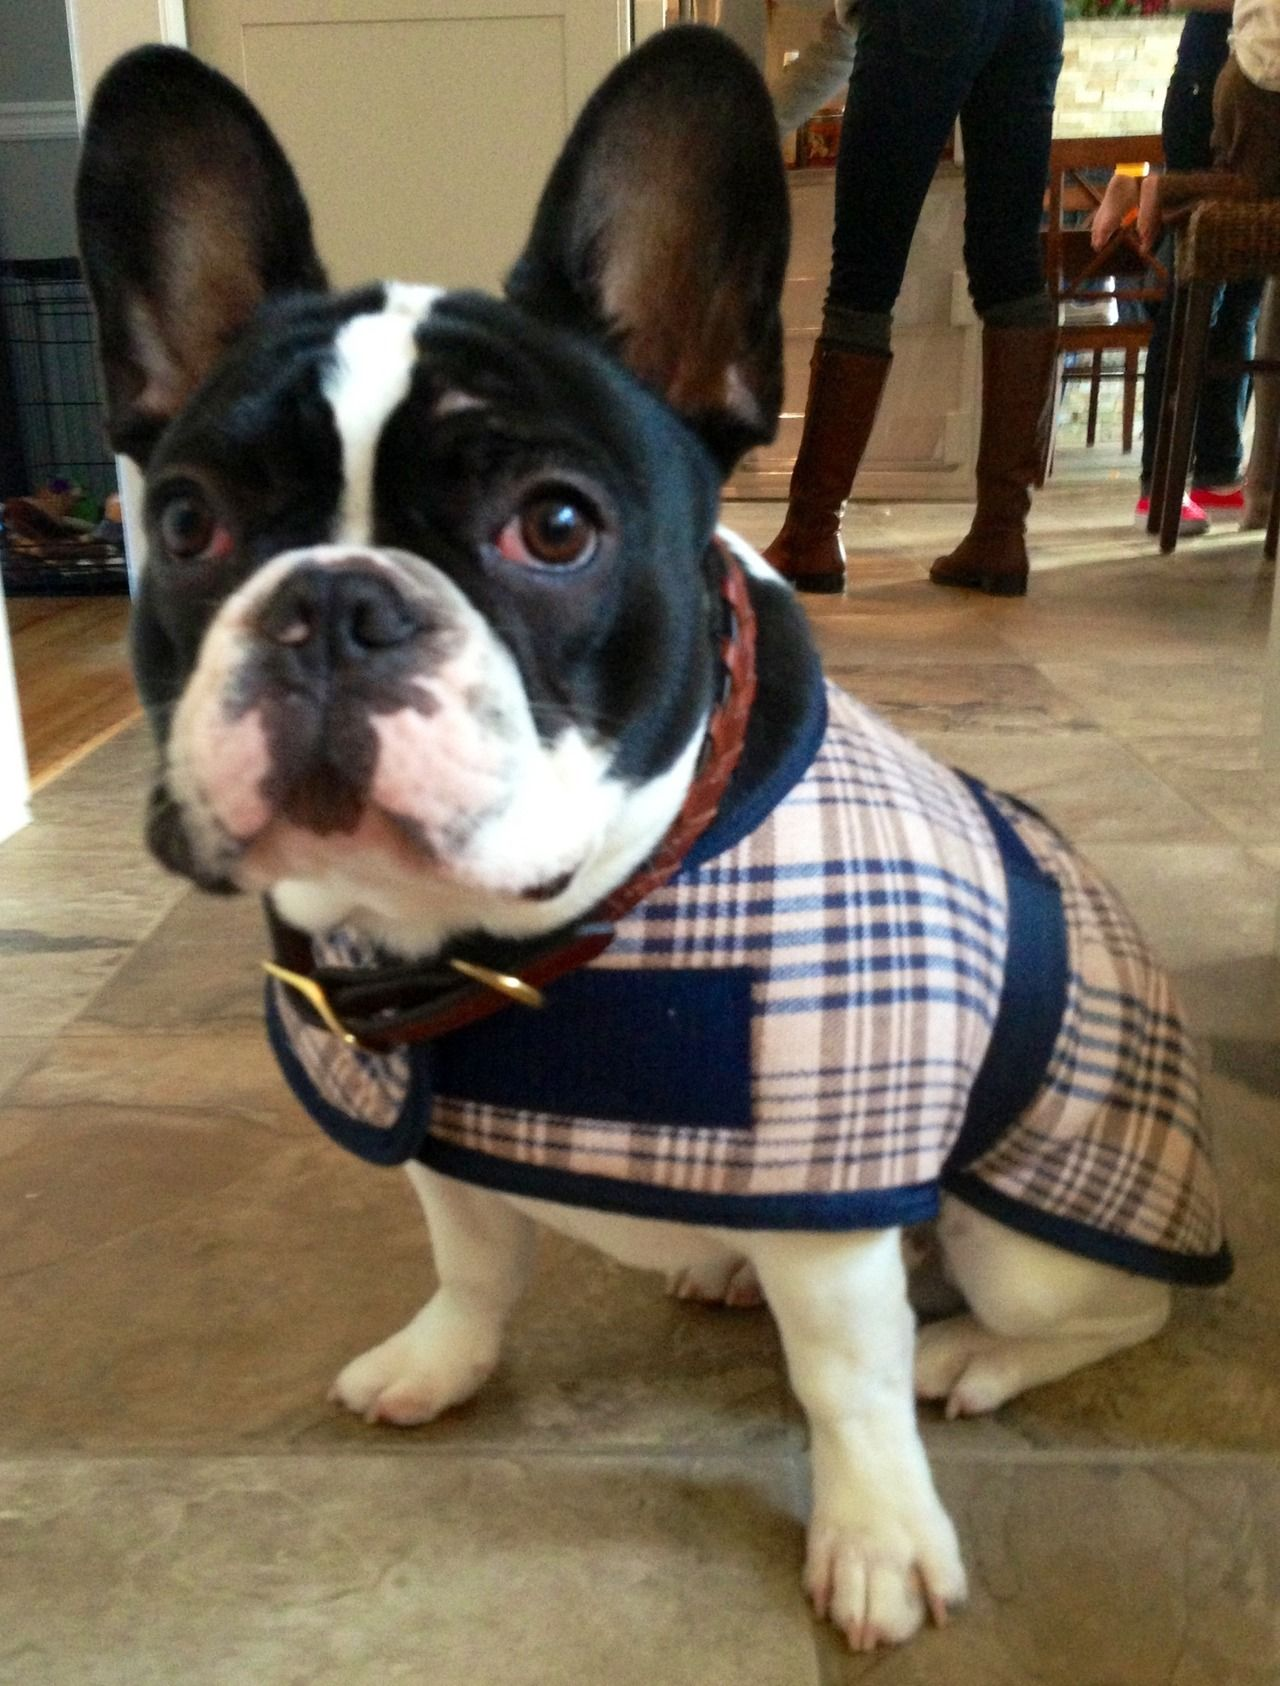 Tug The French Bulldog Very Dapper In His New London Plaid Coat